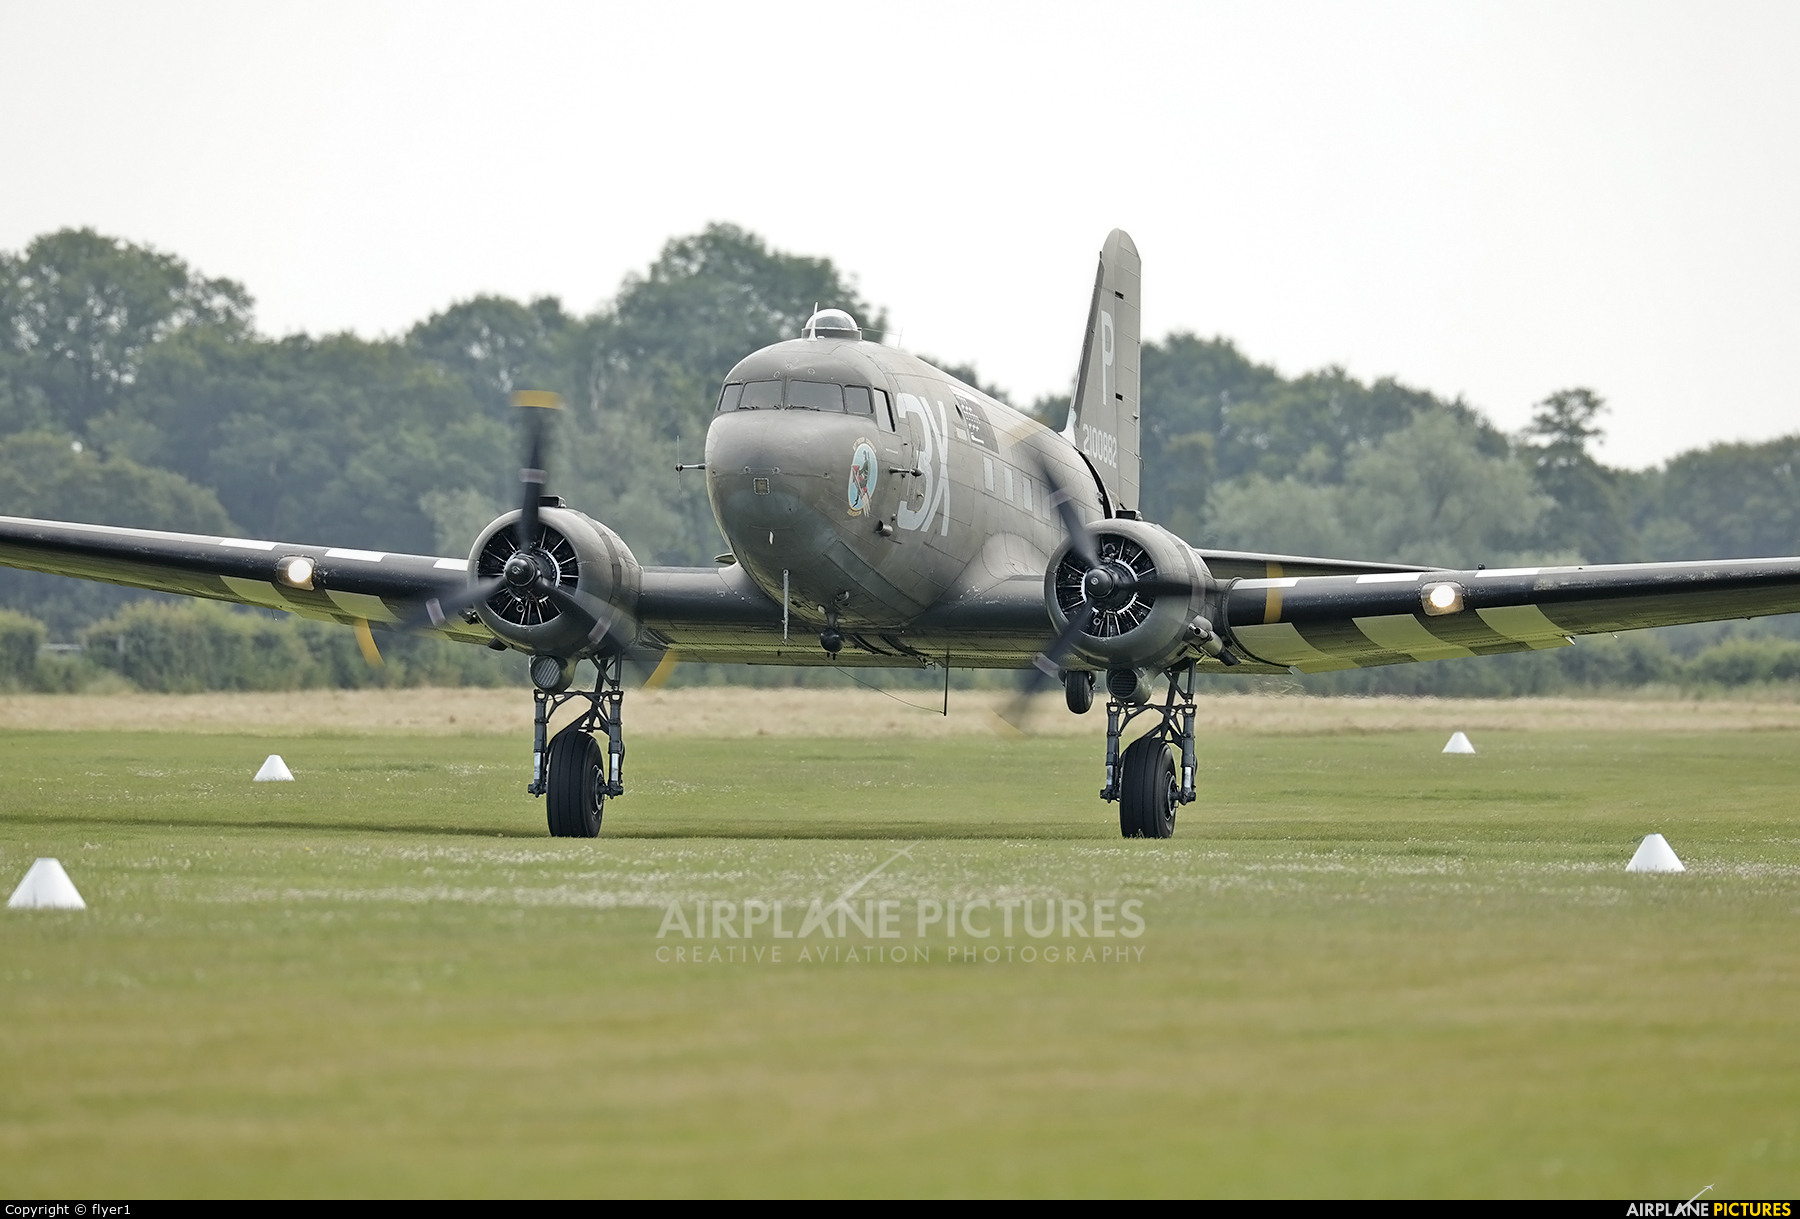 Aerolegends N473DC aircraft at Lashenden / Headcorn